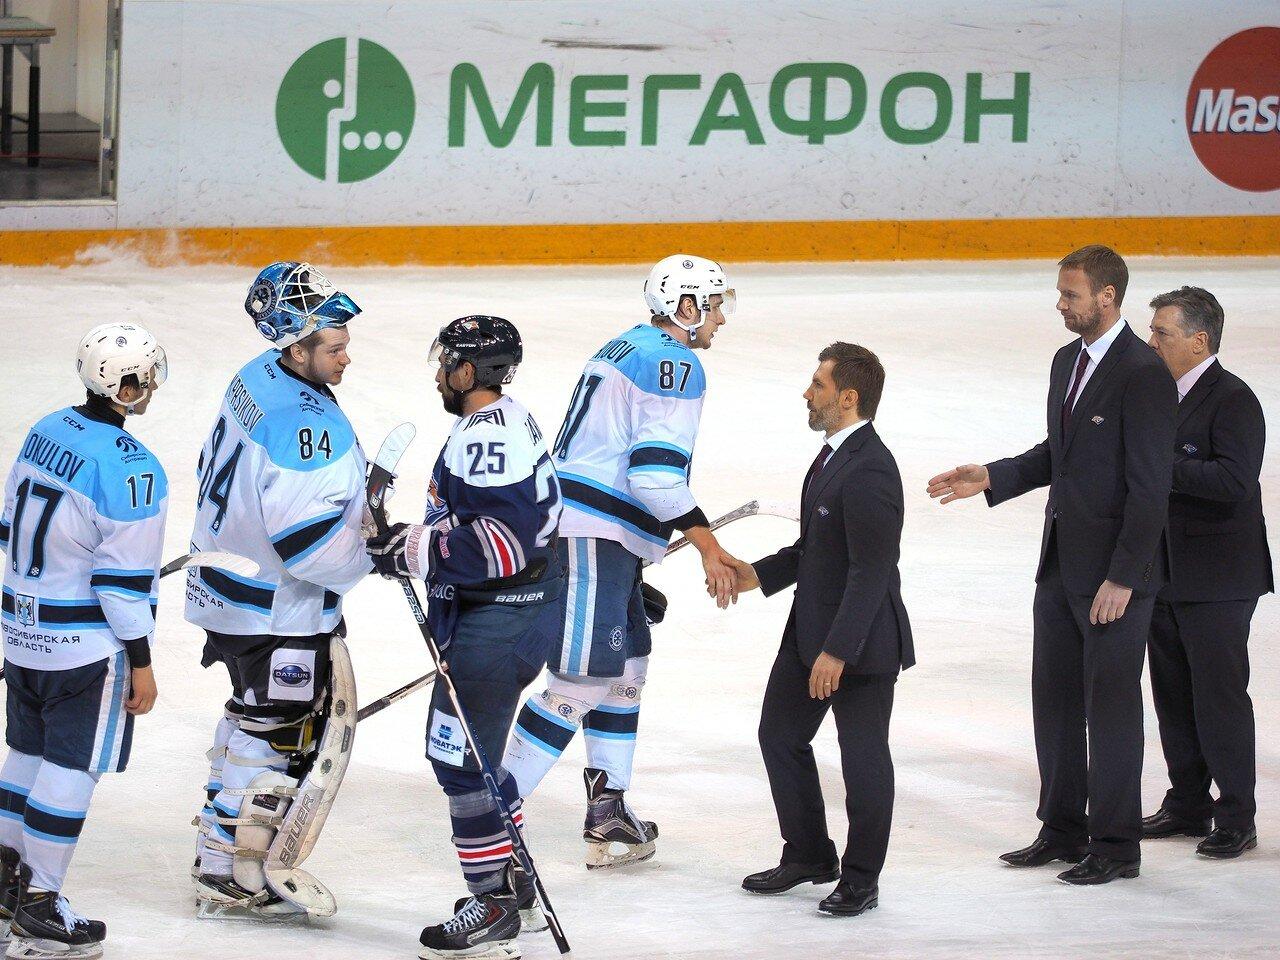 86Плей-офф 2016 Восток 1/2 Металлург - Сибирь 16.03.2016